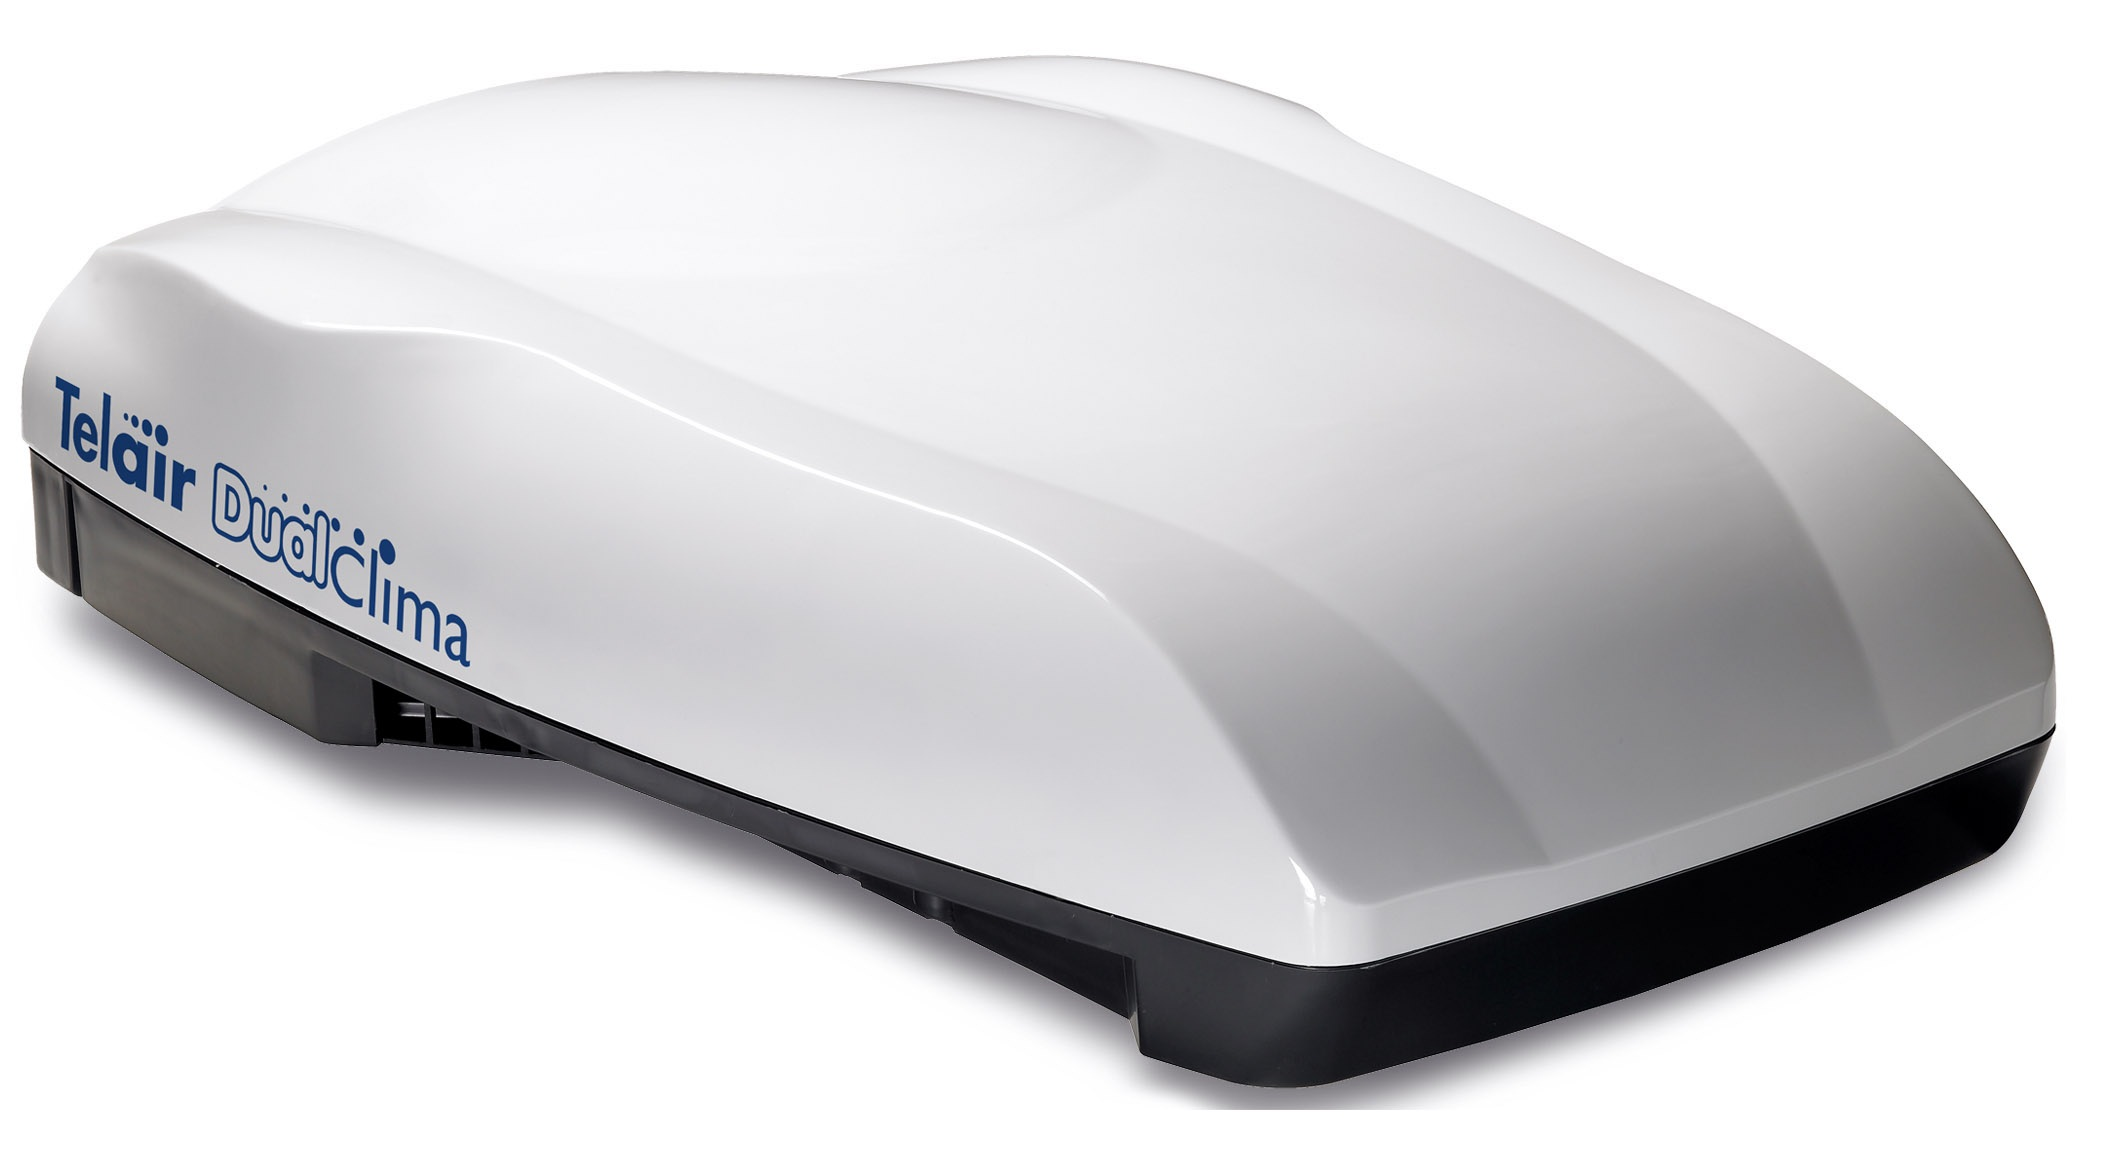 Telair Dualclima airconditioner